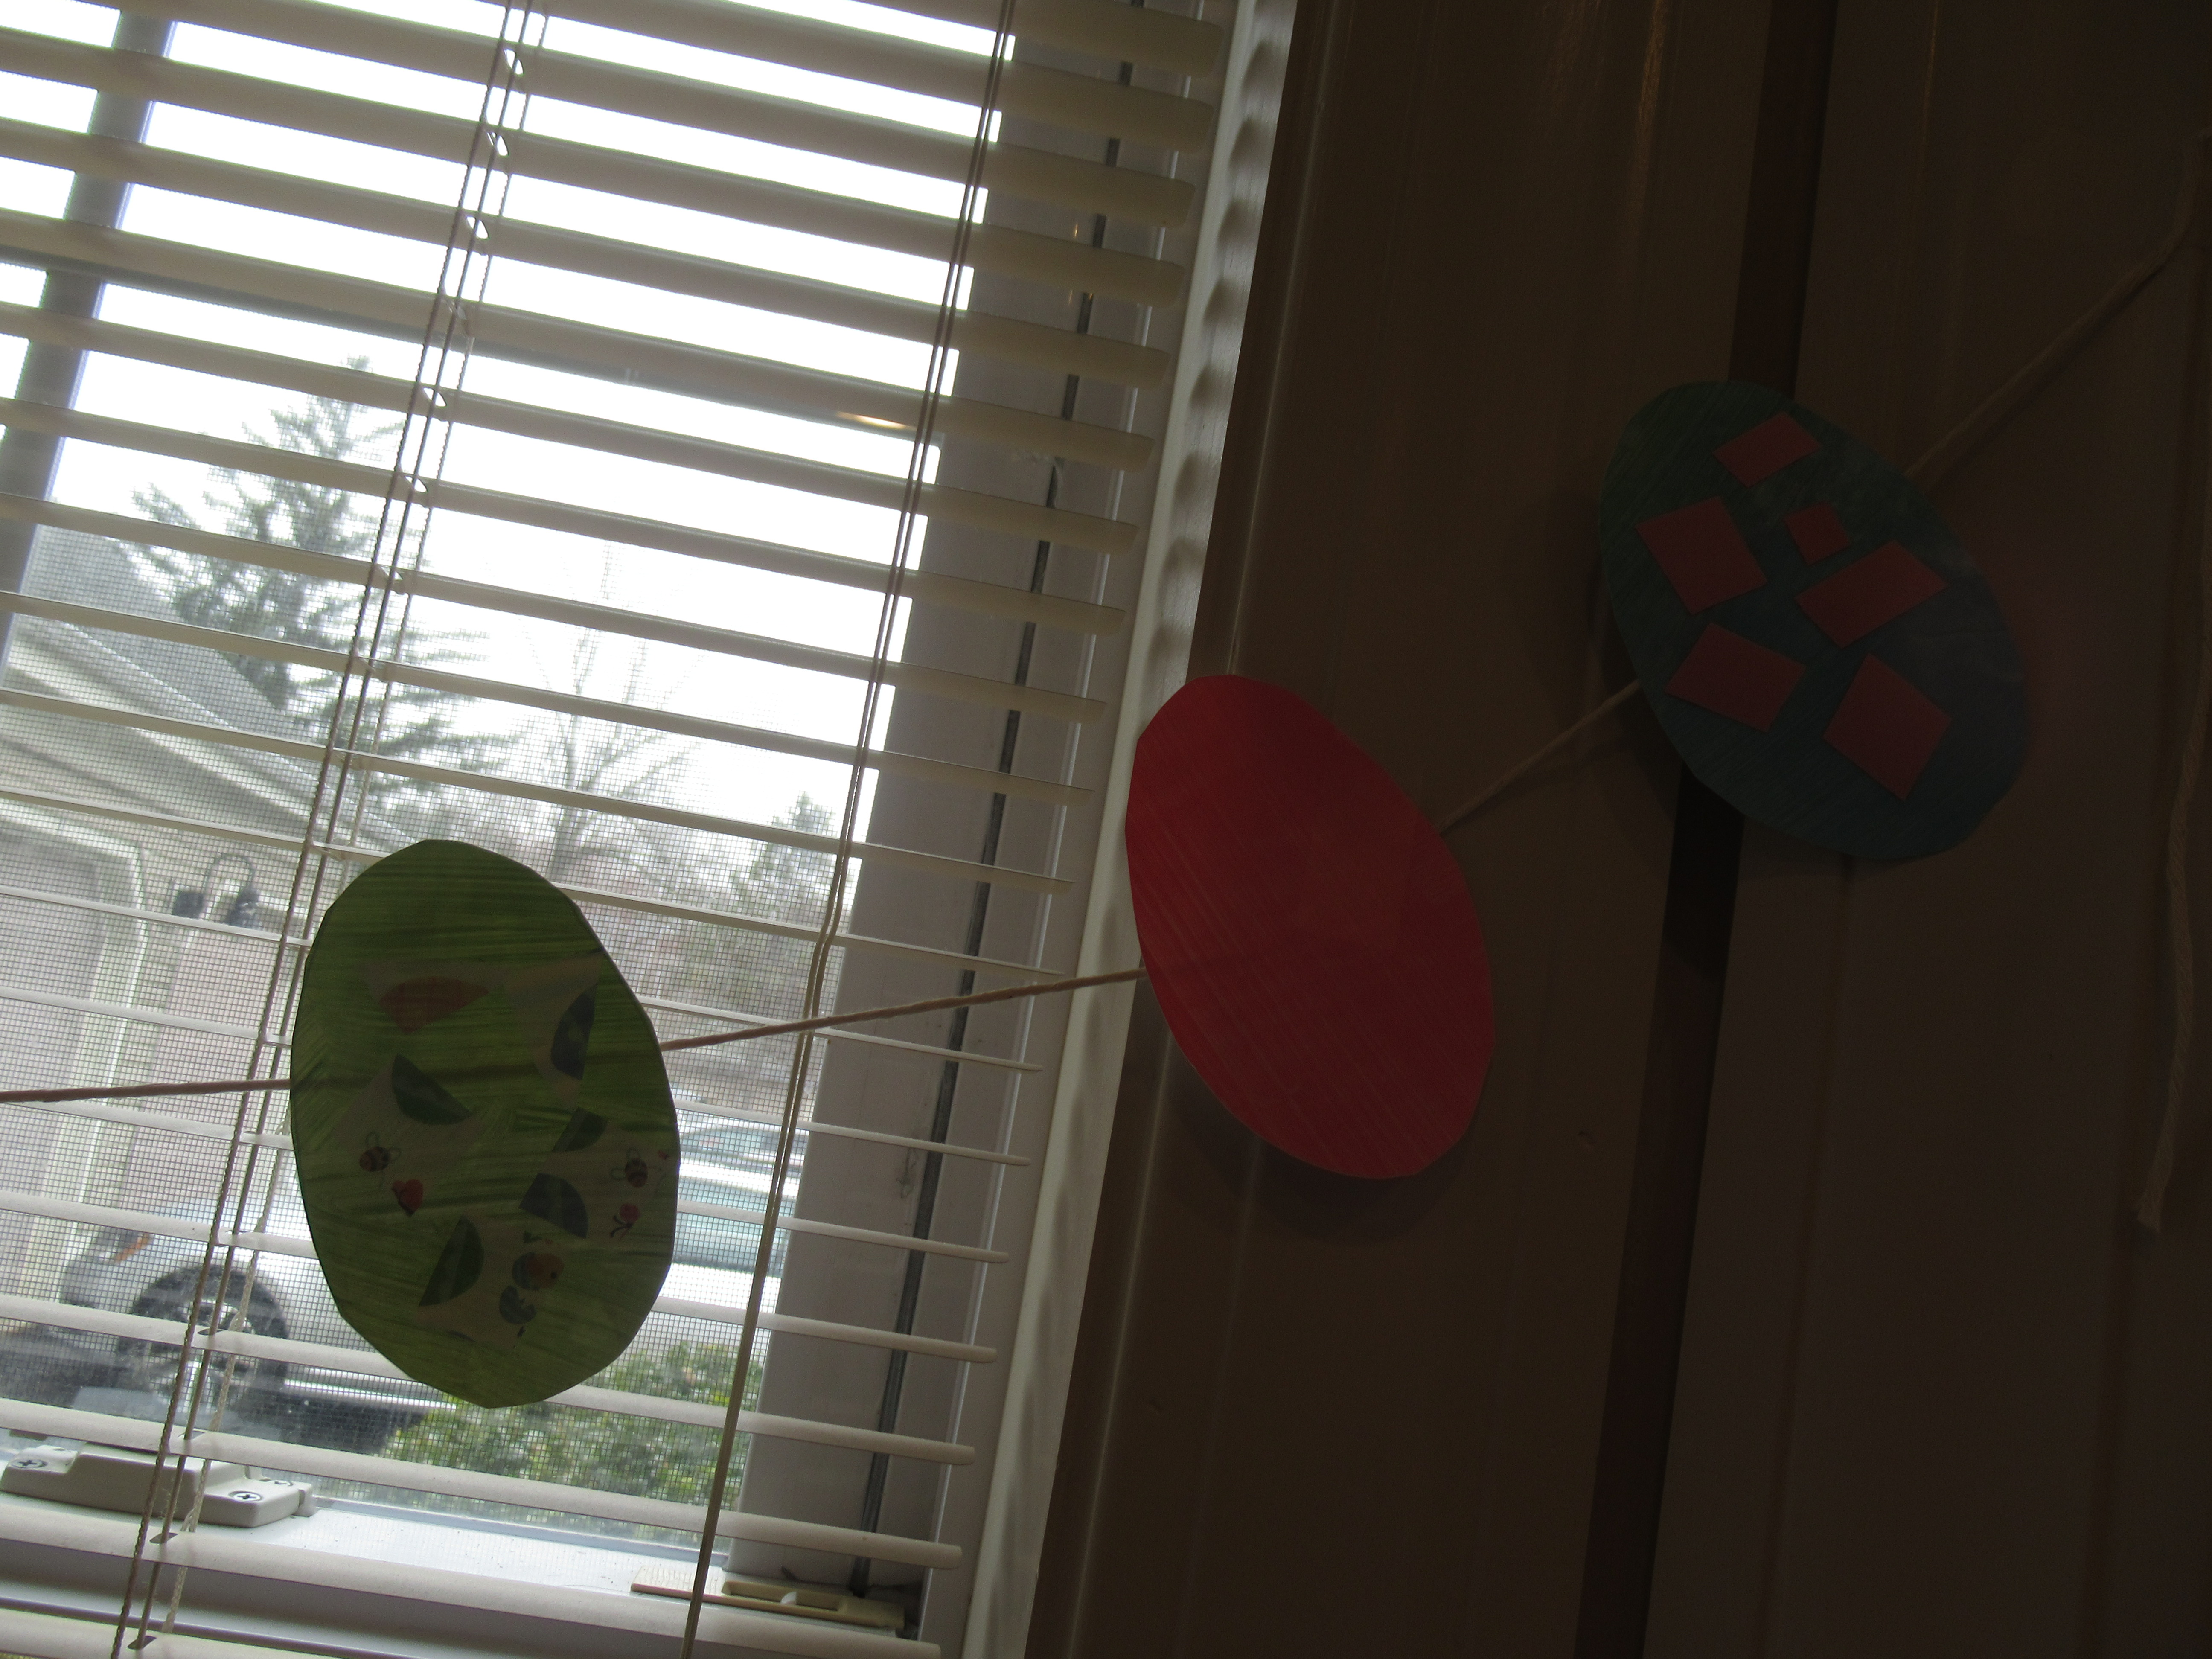 Easter Egg Creation Station c